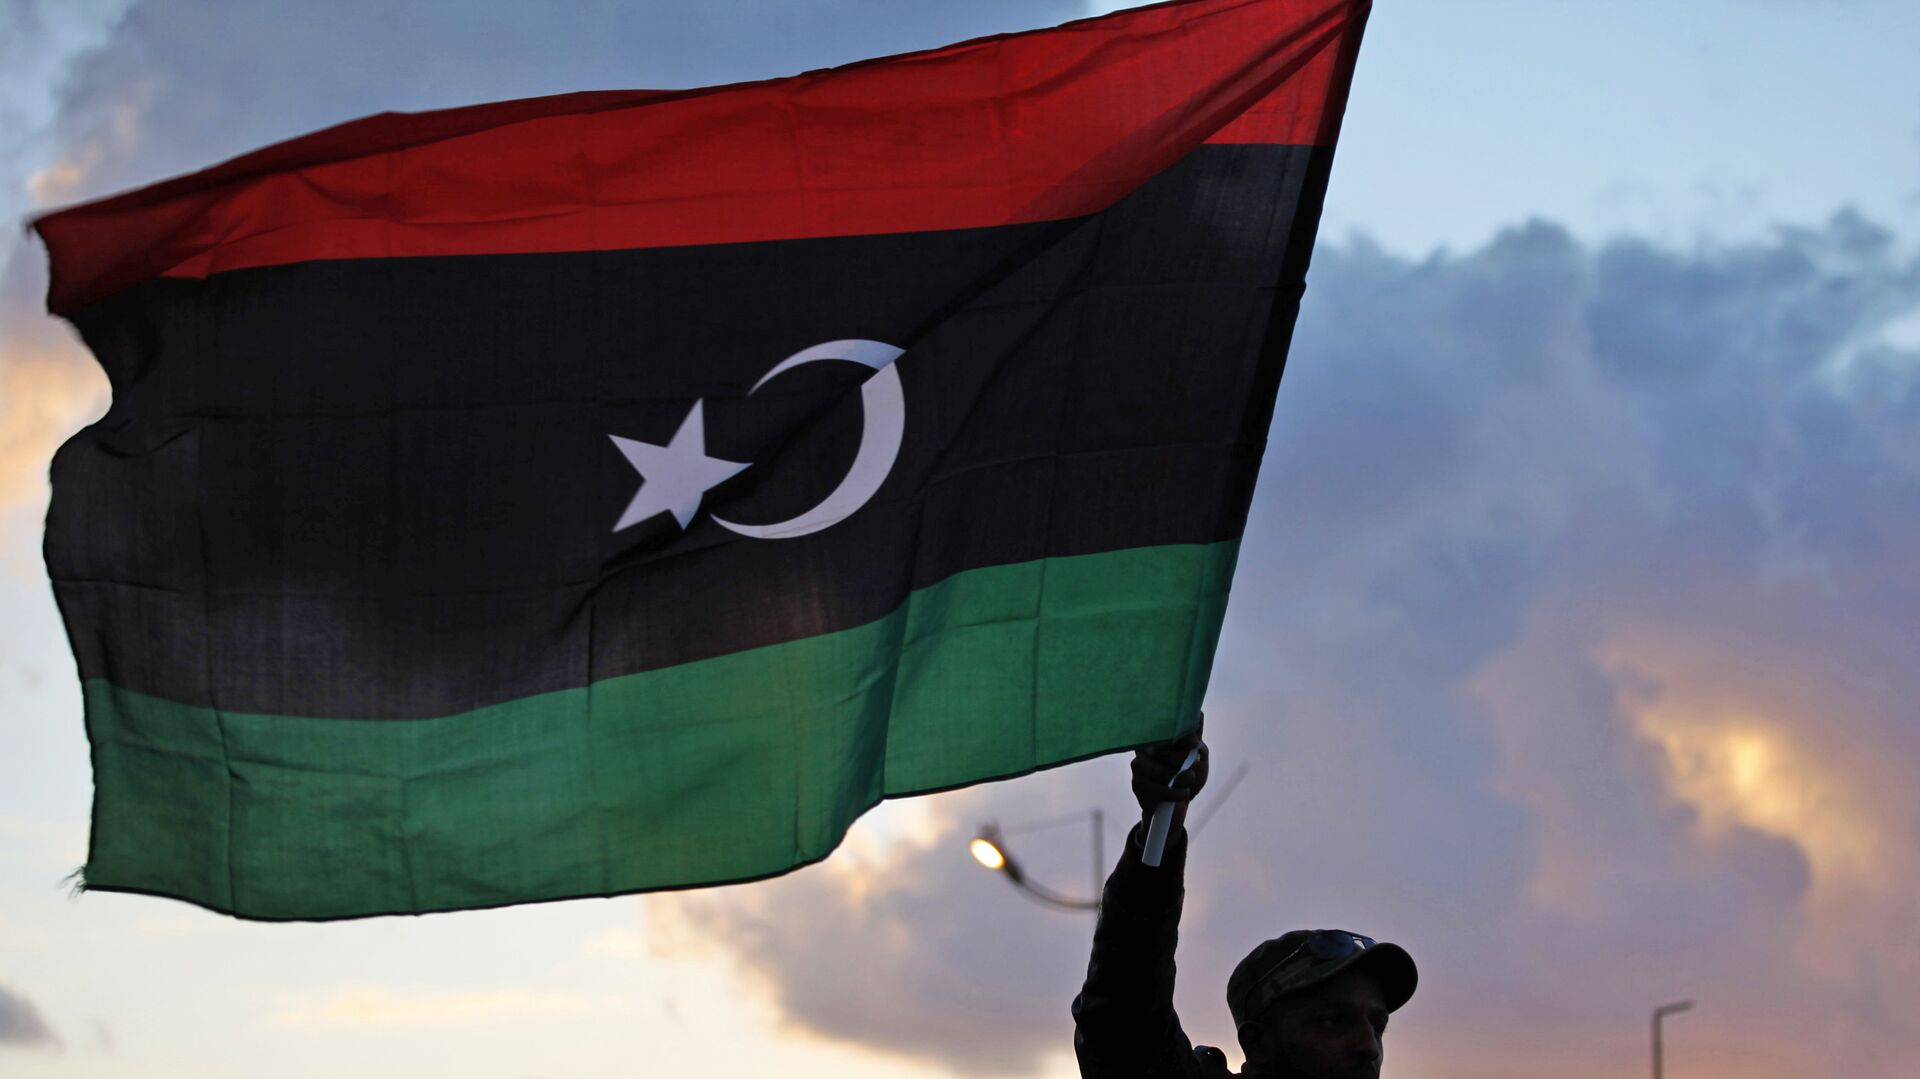 Bandera de Libia - Sputnik Mundo, 1920, 10.05.2021